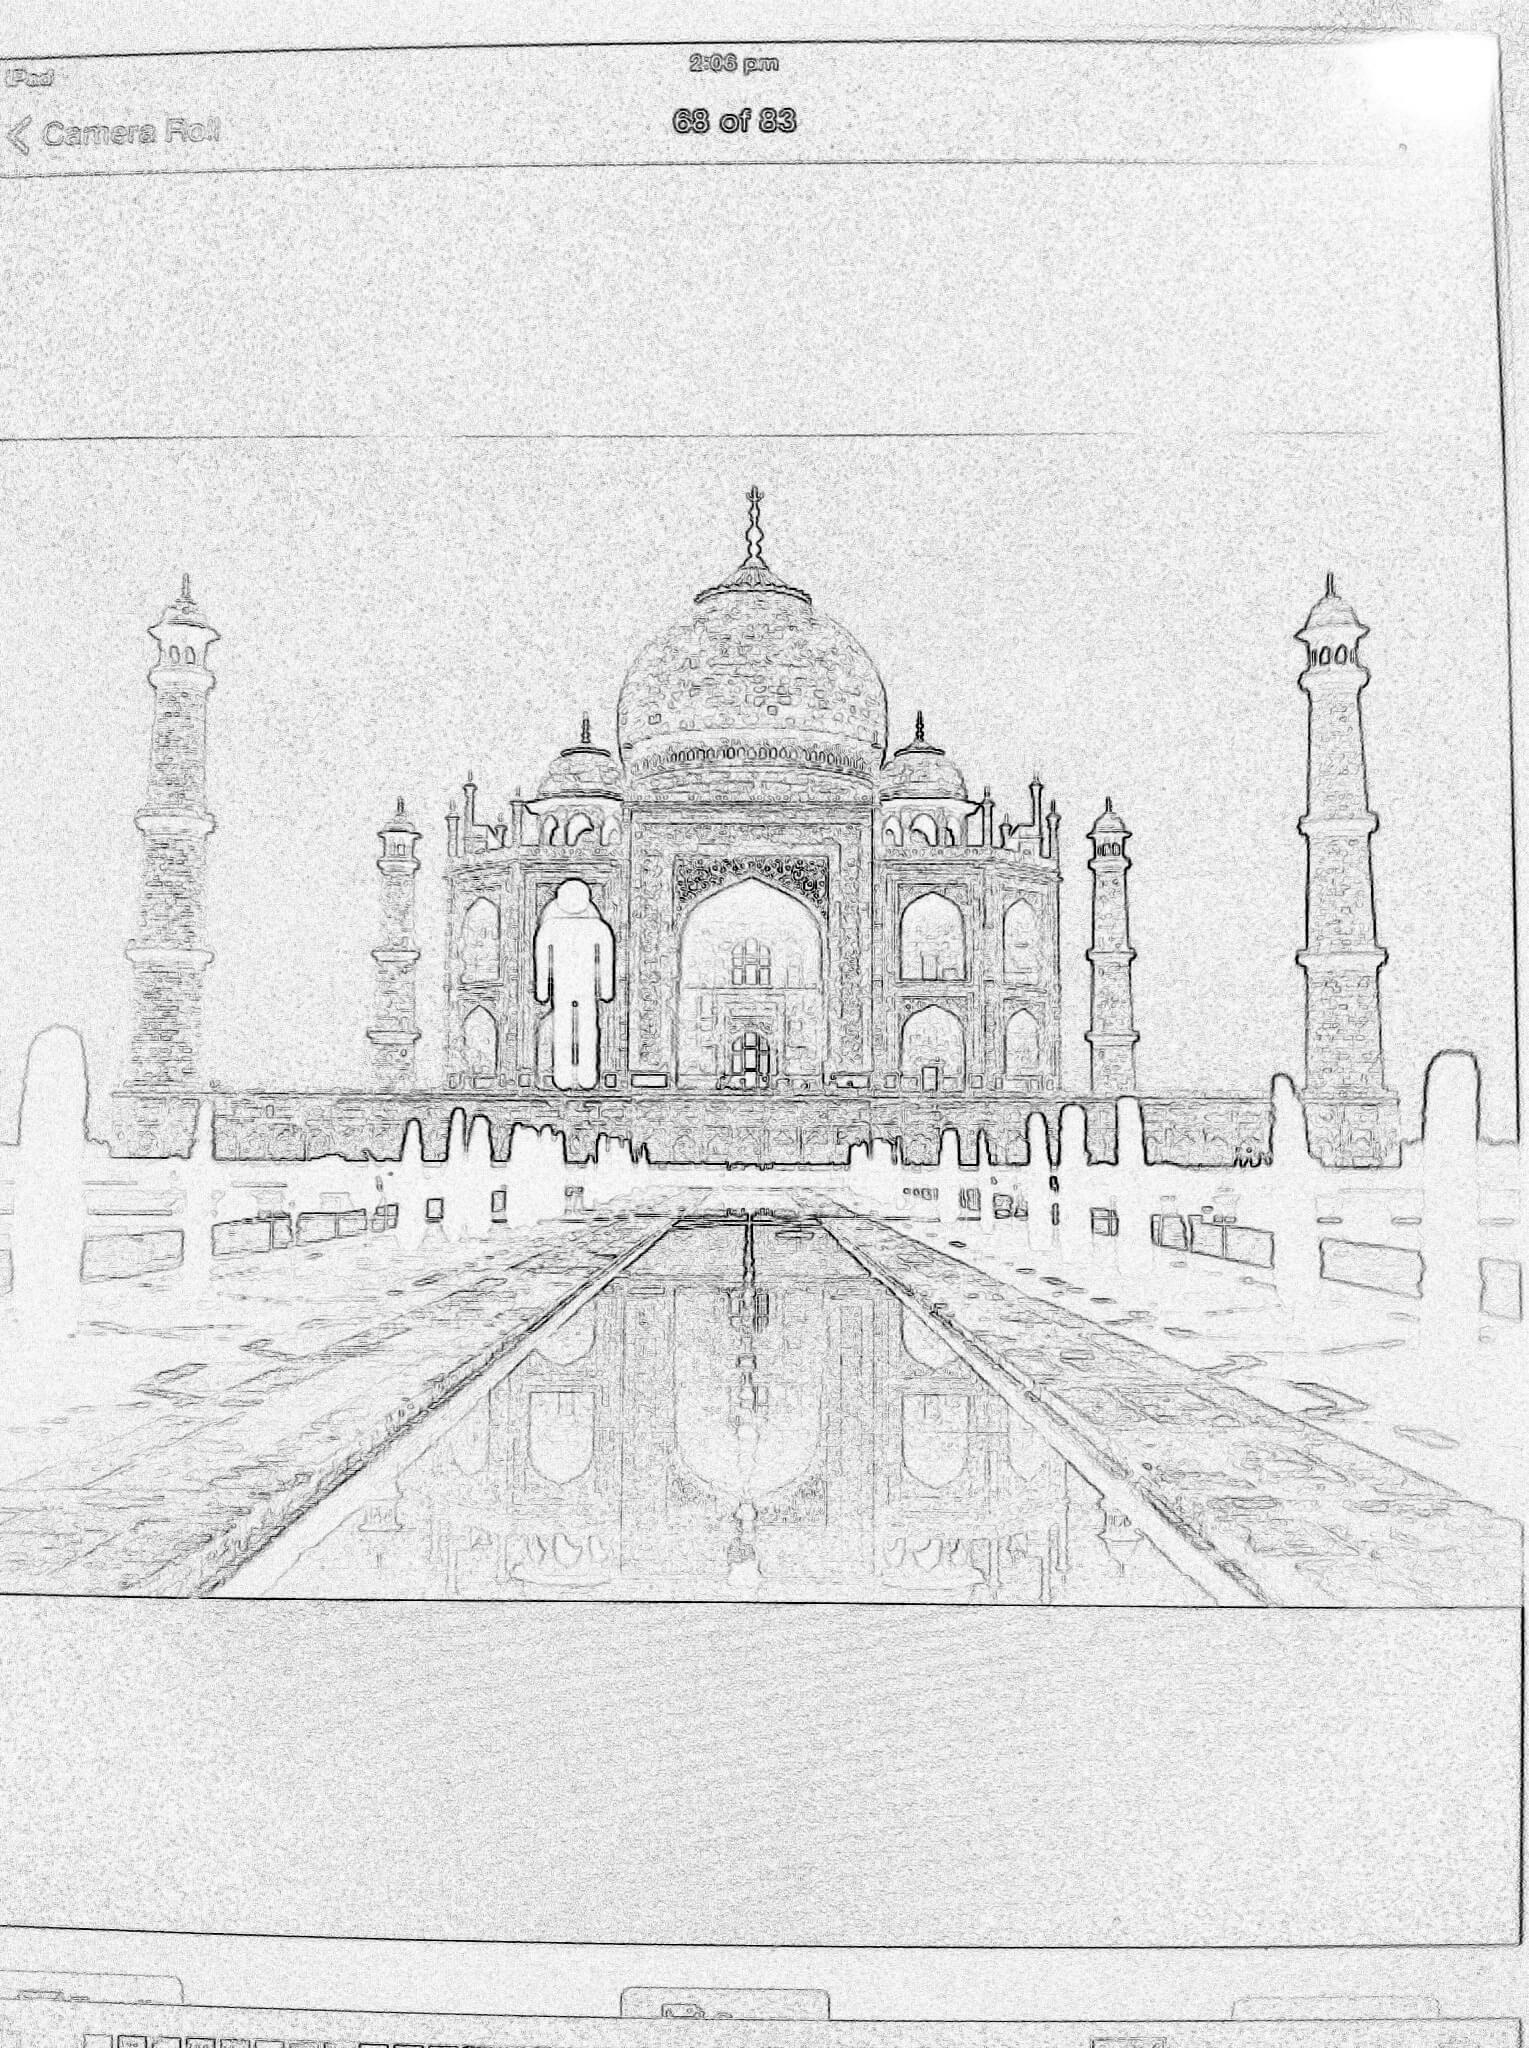 processed image